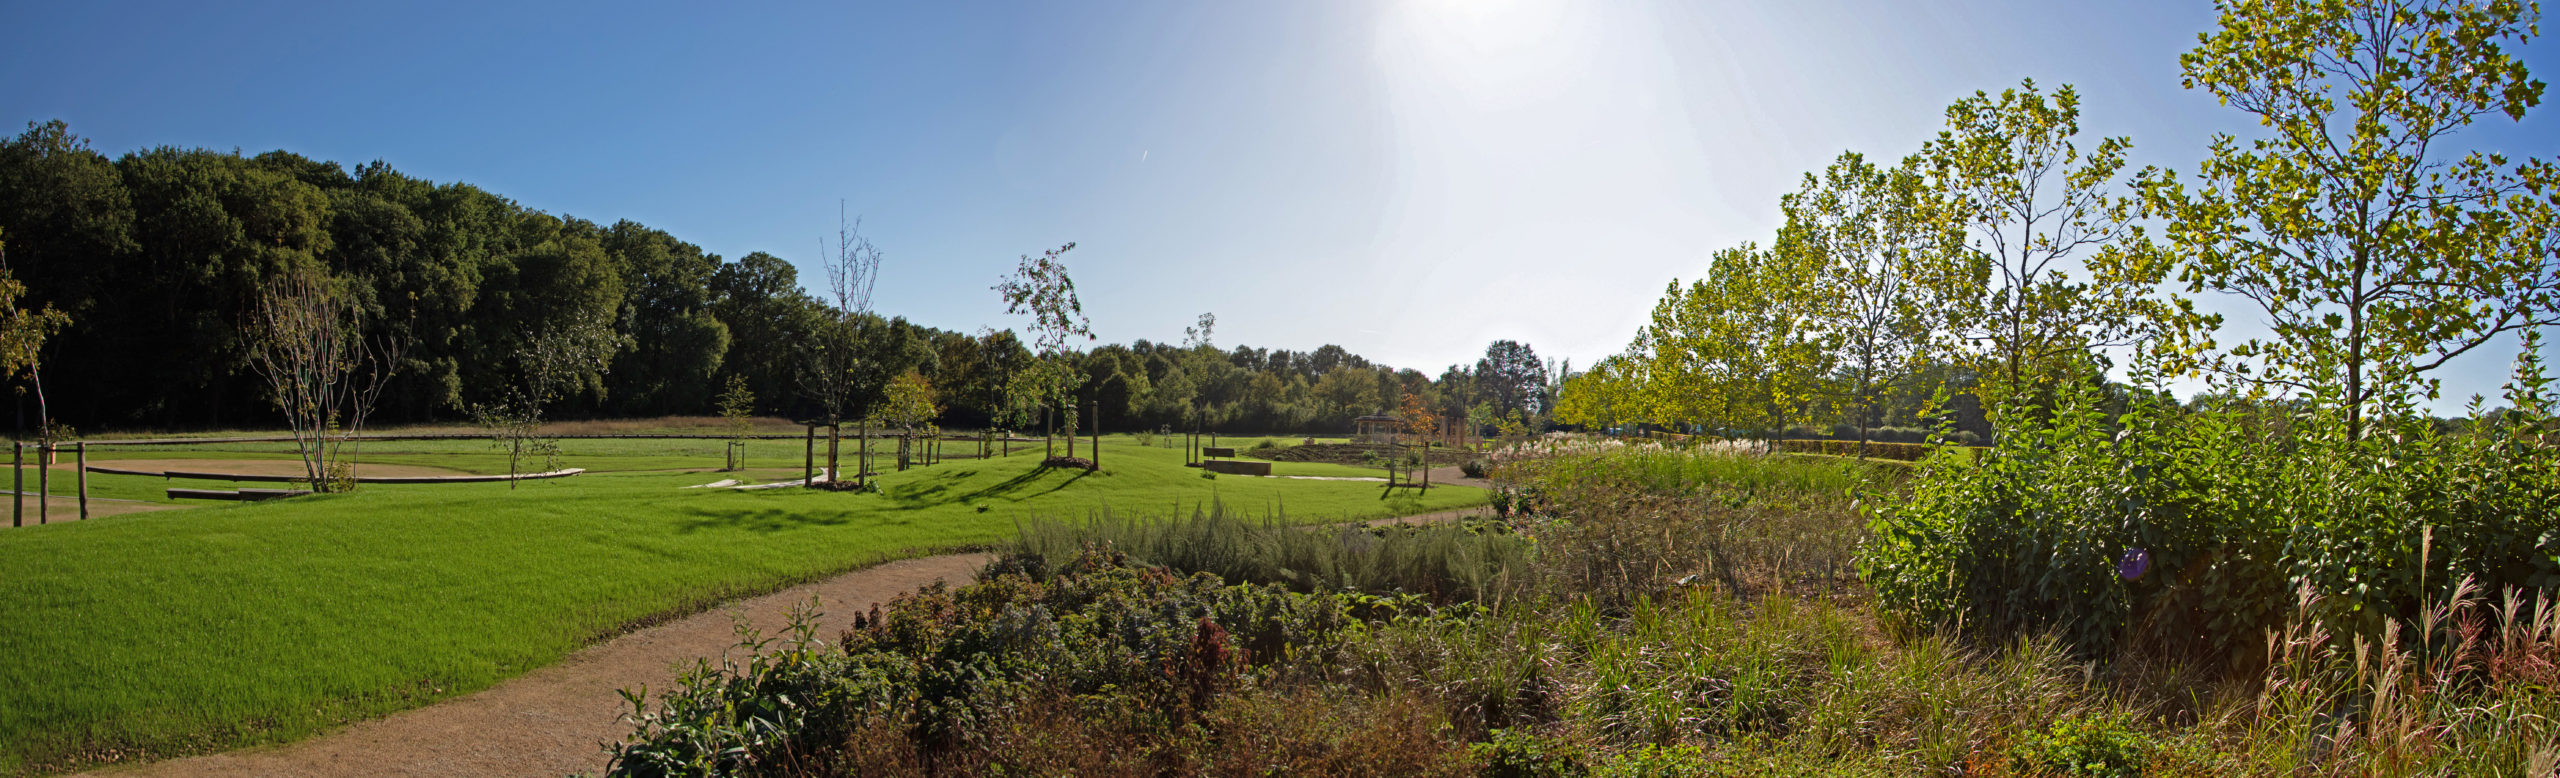 jardin-botanique-idspace